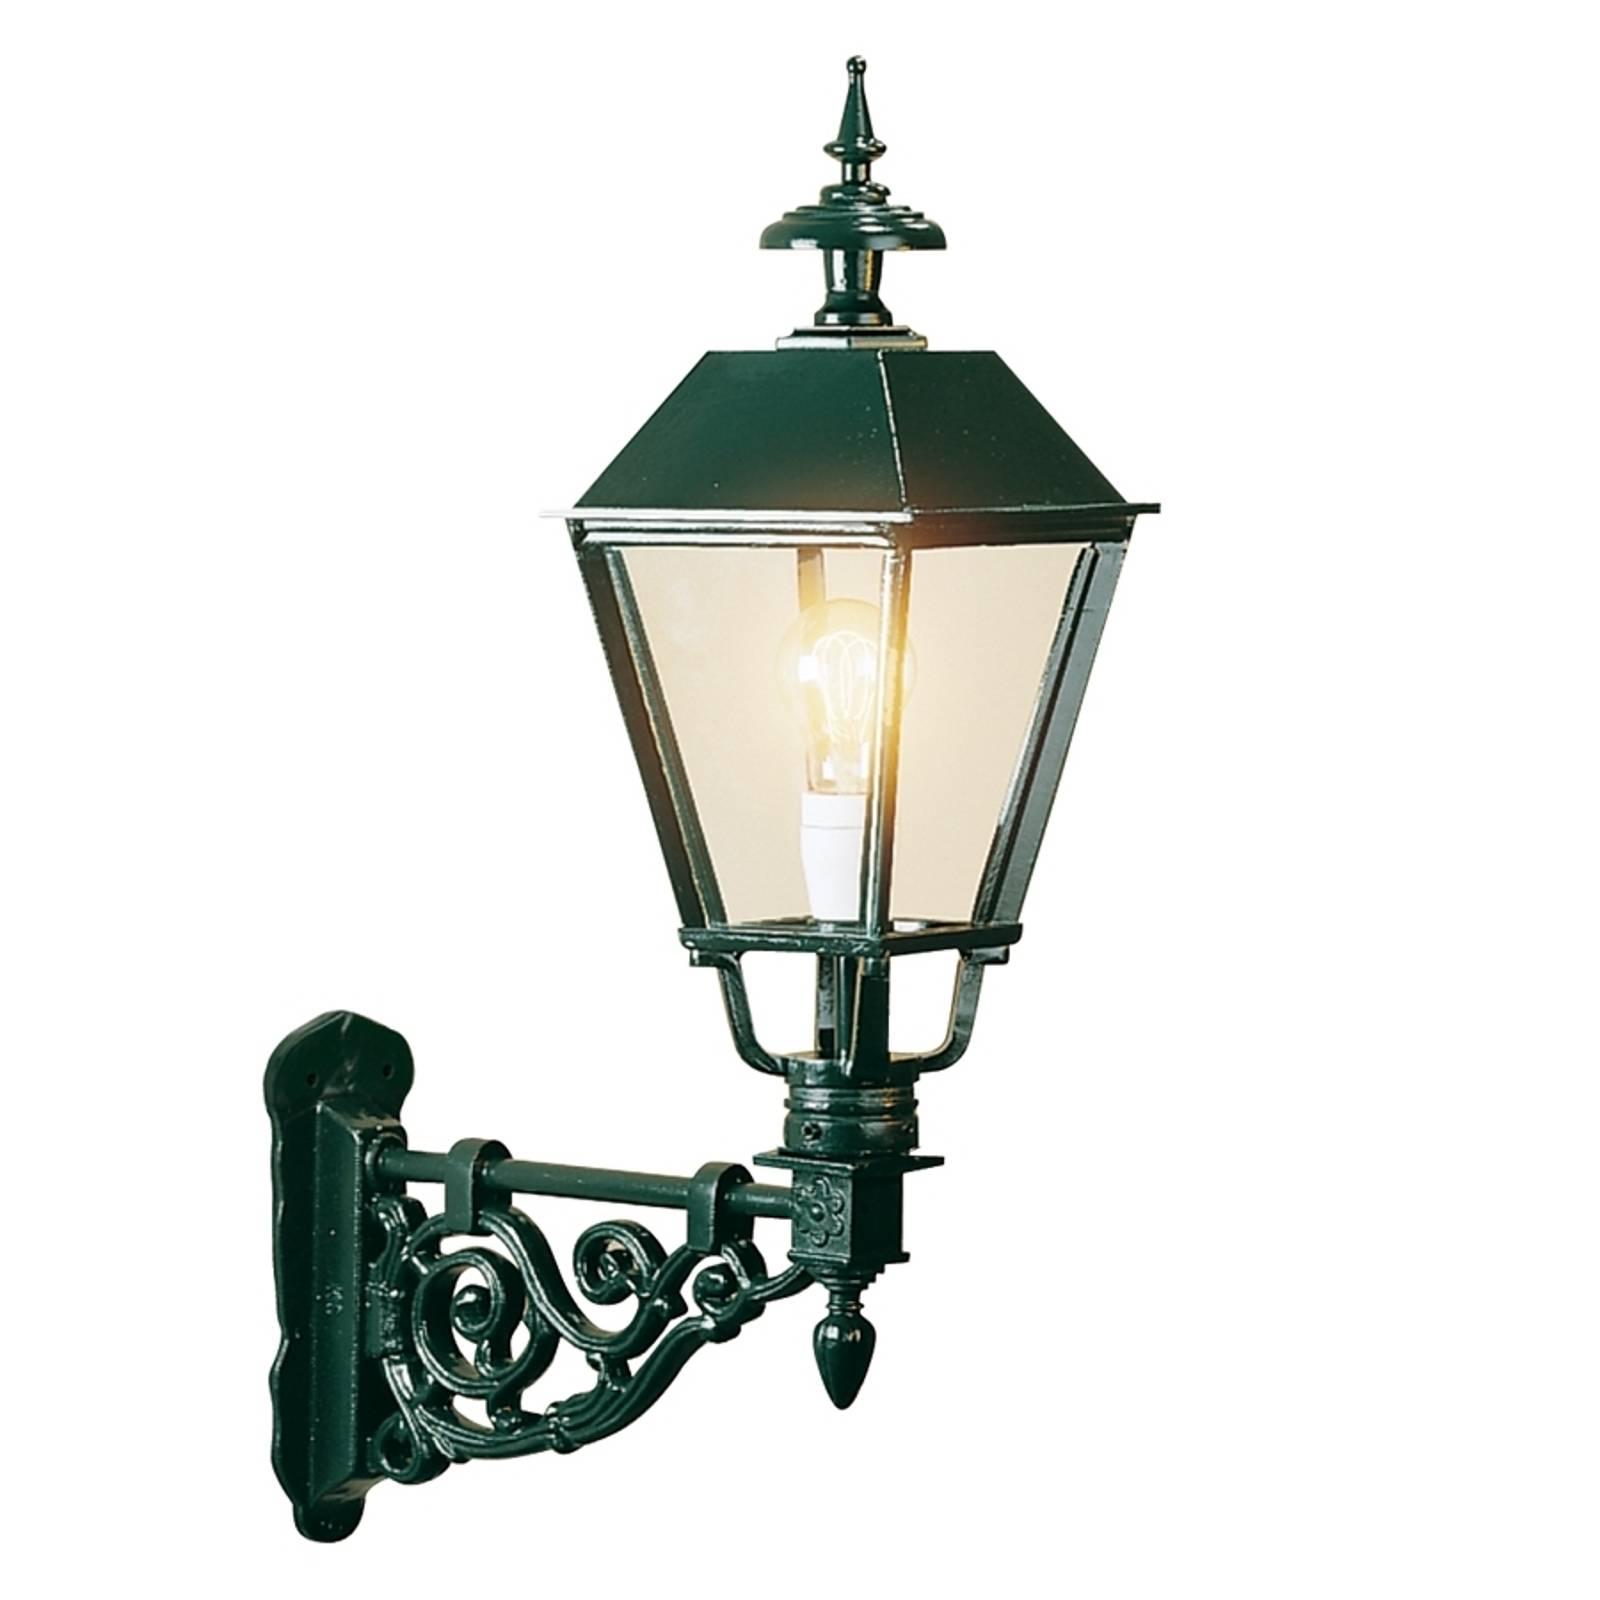 Buitenwandlamp Egmont, groen